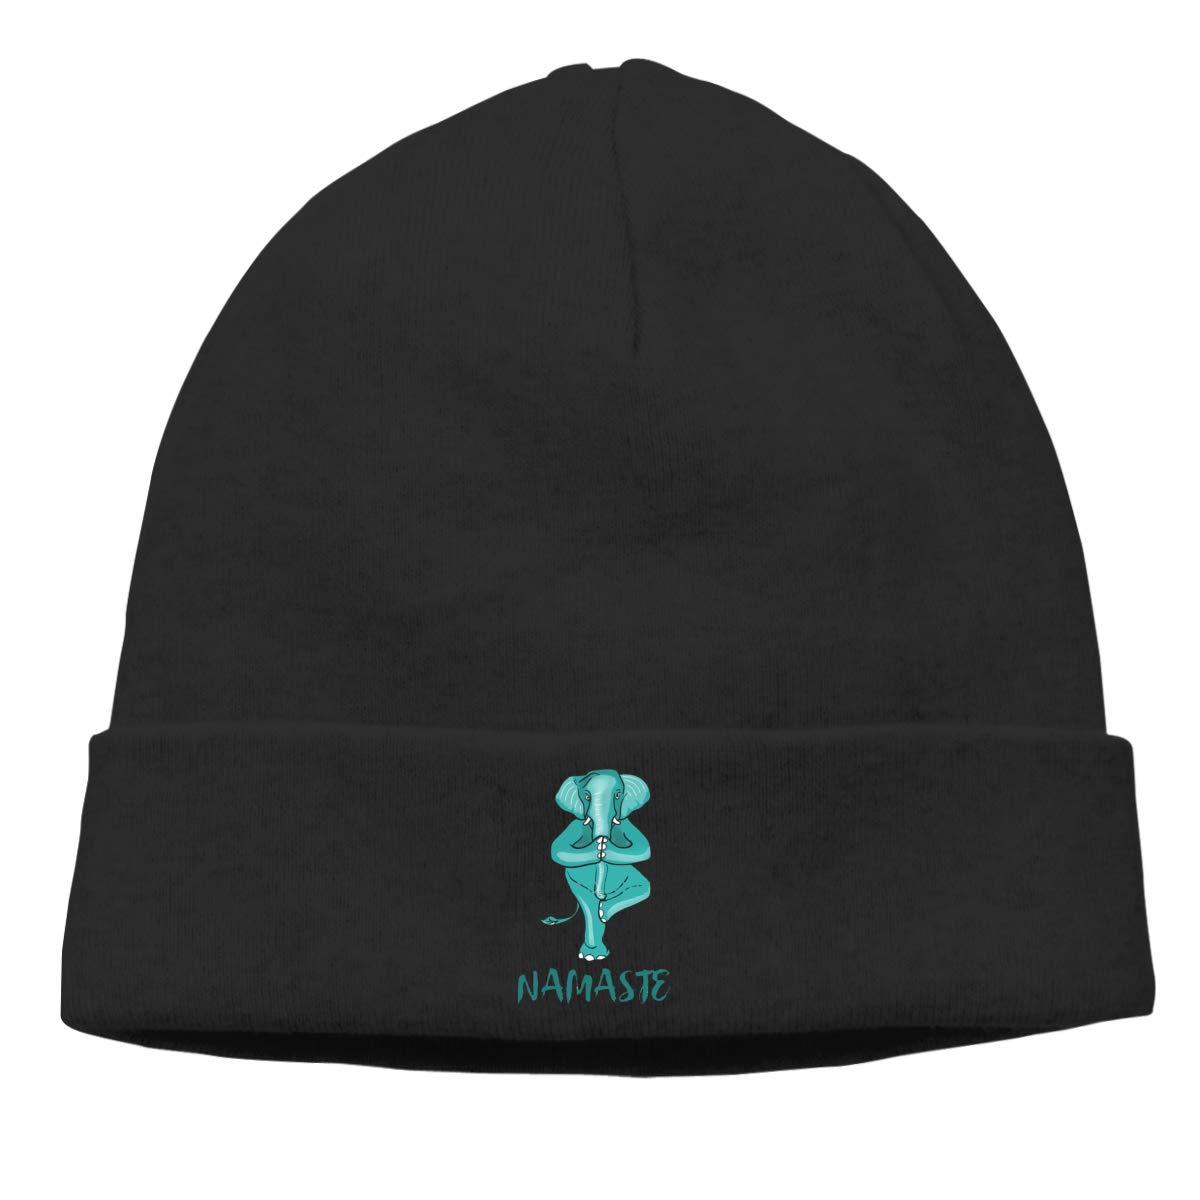 Sootot Yoga Elephant Namaste Dad Beanie Hats Cap Mens/&Womens Warm /& Stylish Skull Cap Beanie Skull Cap